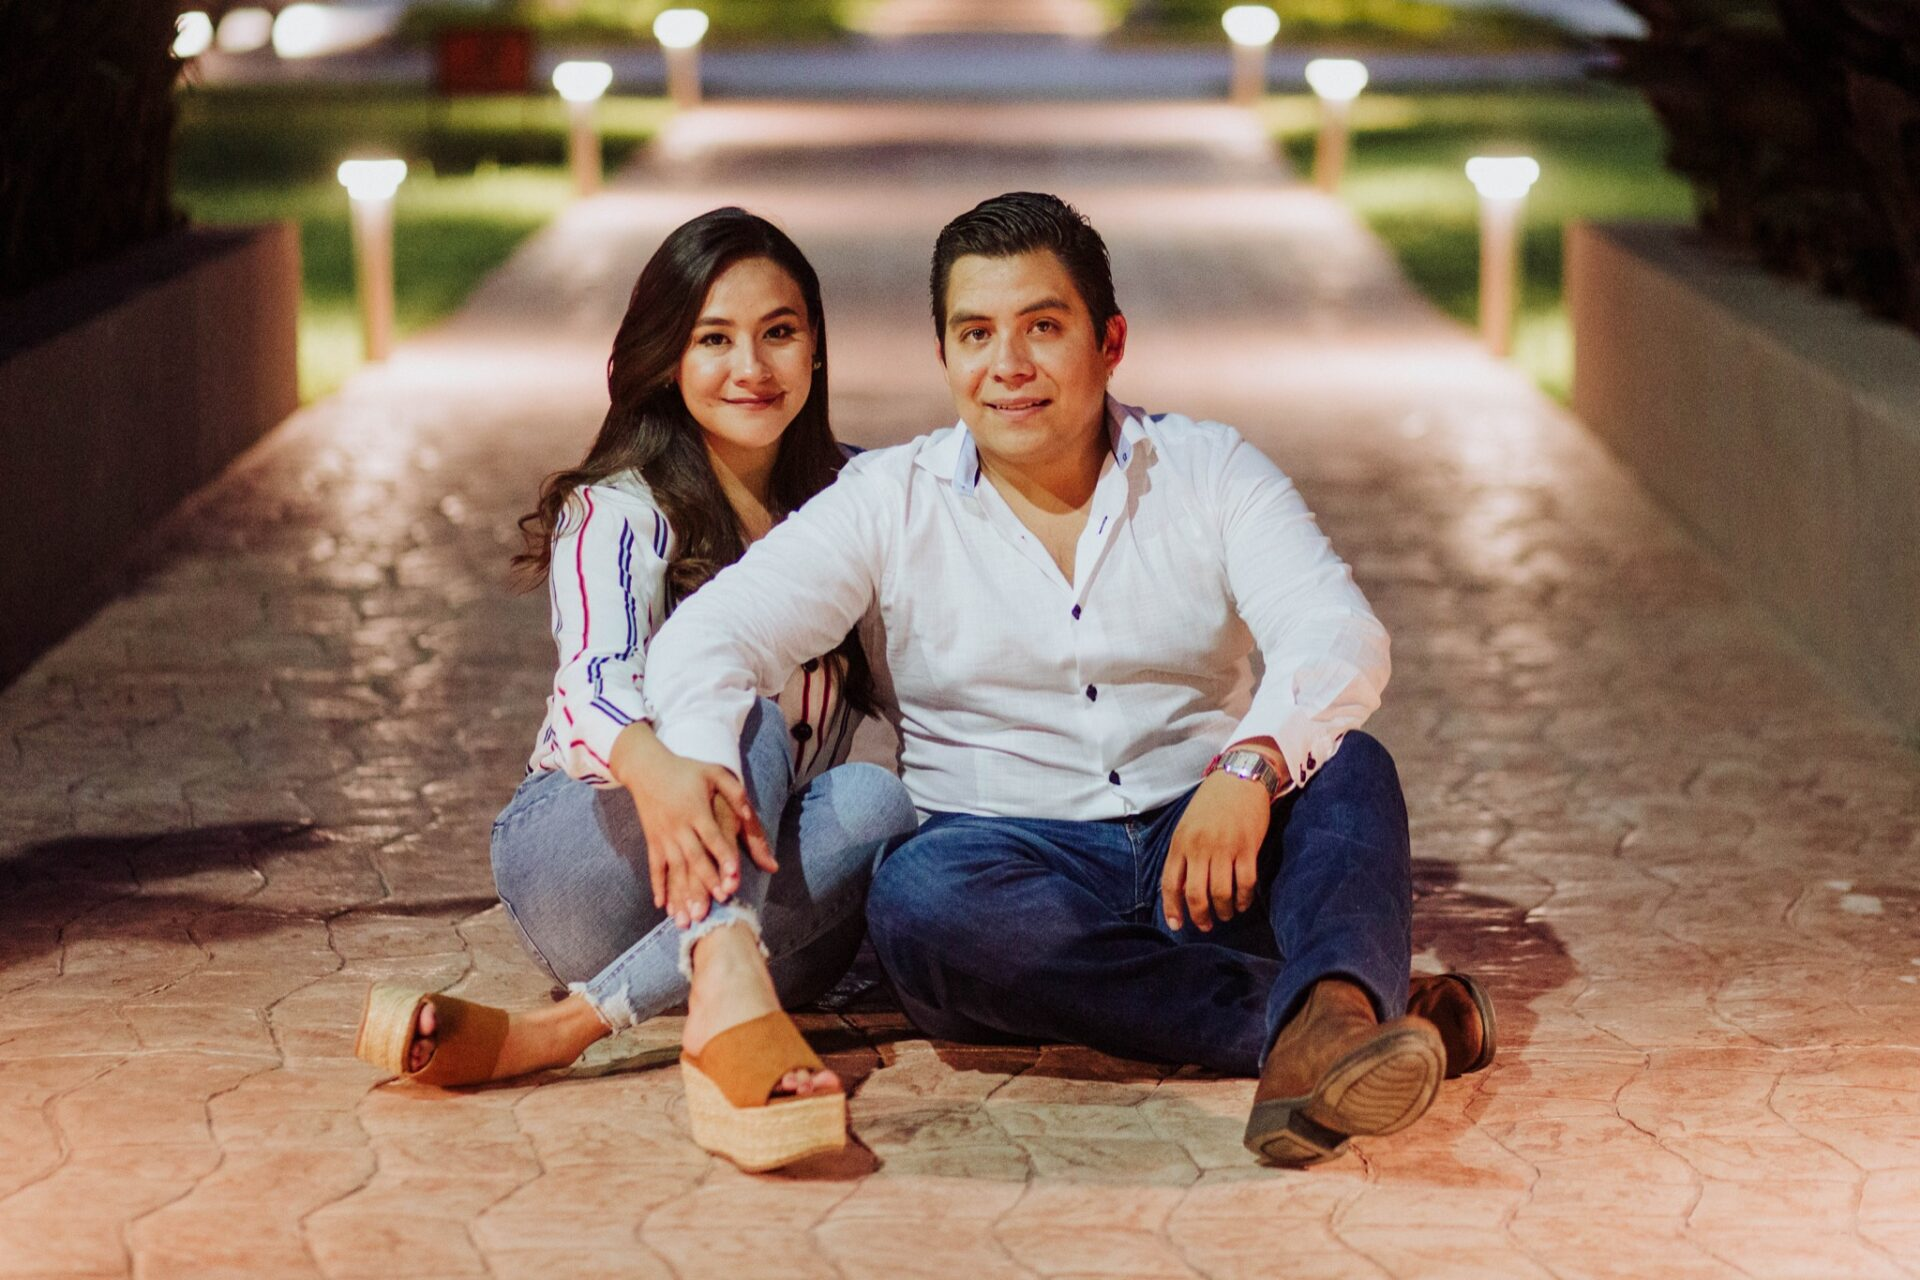 javier_noriega_fotografo_bodas_save_the_date_preboda_torreon_coahuila_zacatecas_wedding_photographer7